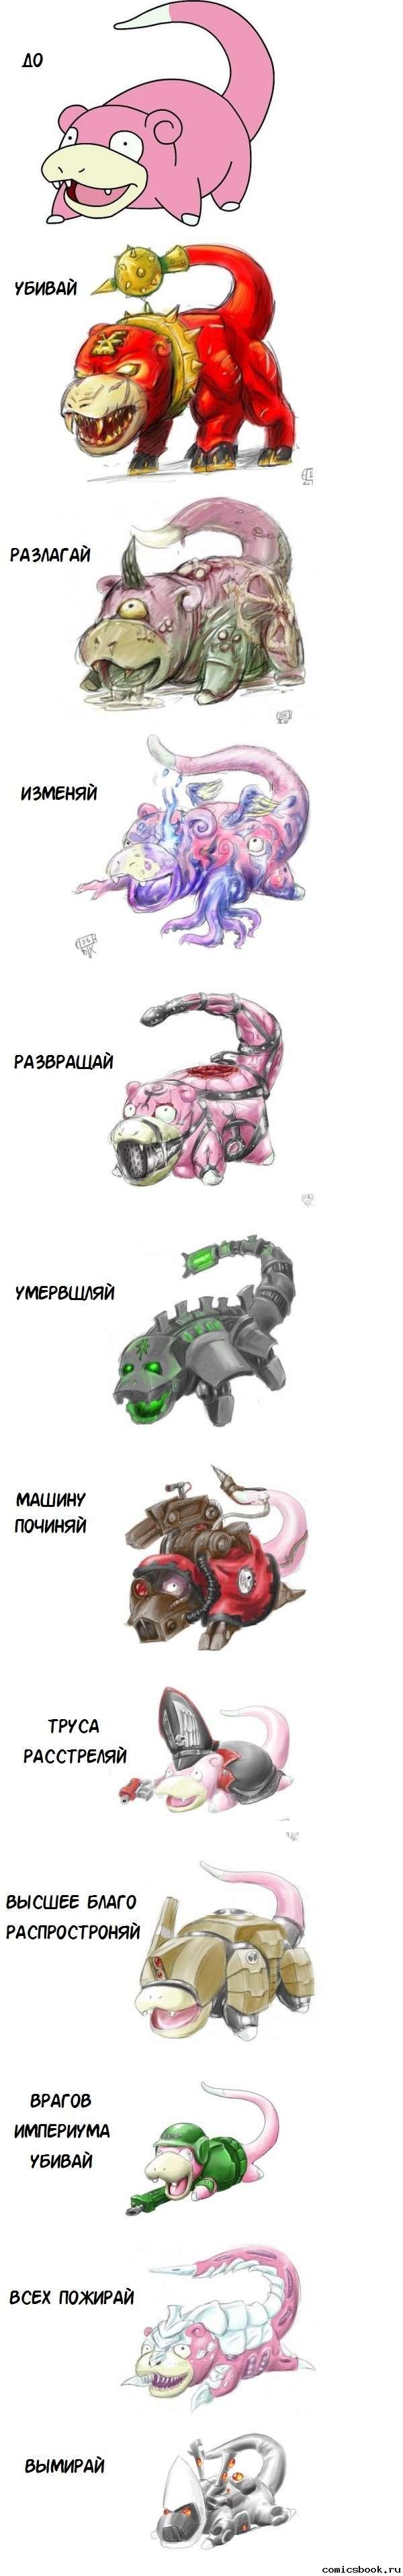 [Humour 40K] Collection d'images humoristiques - Page 5 D09ad010